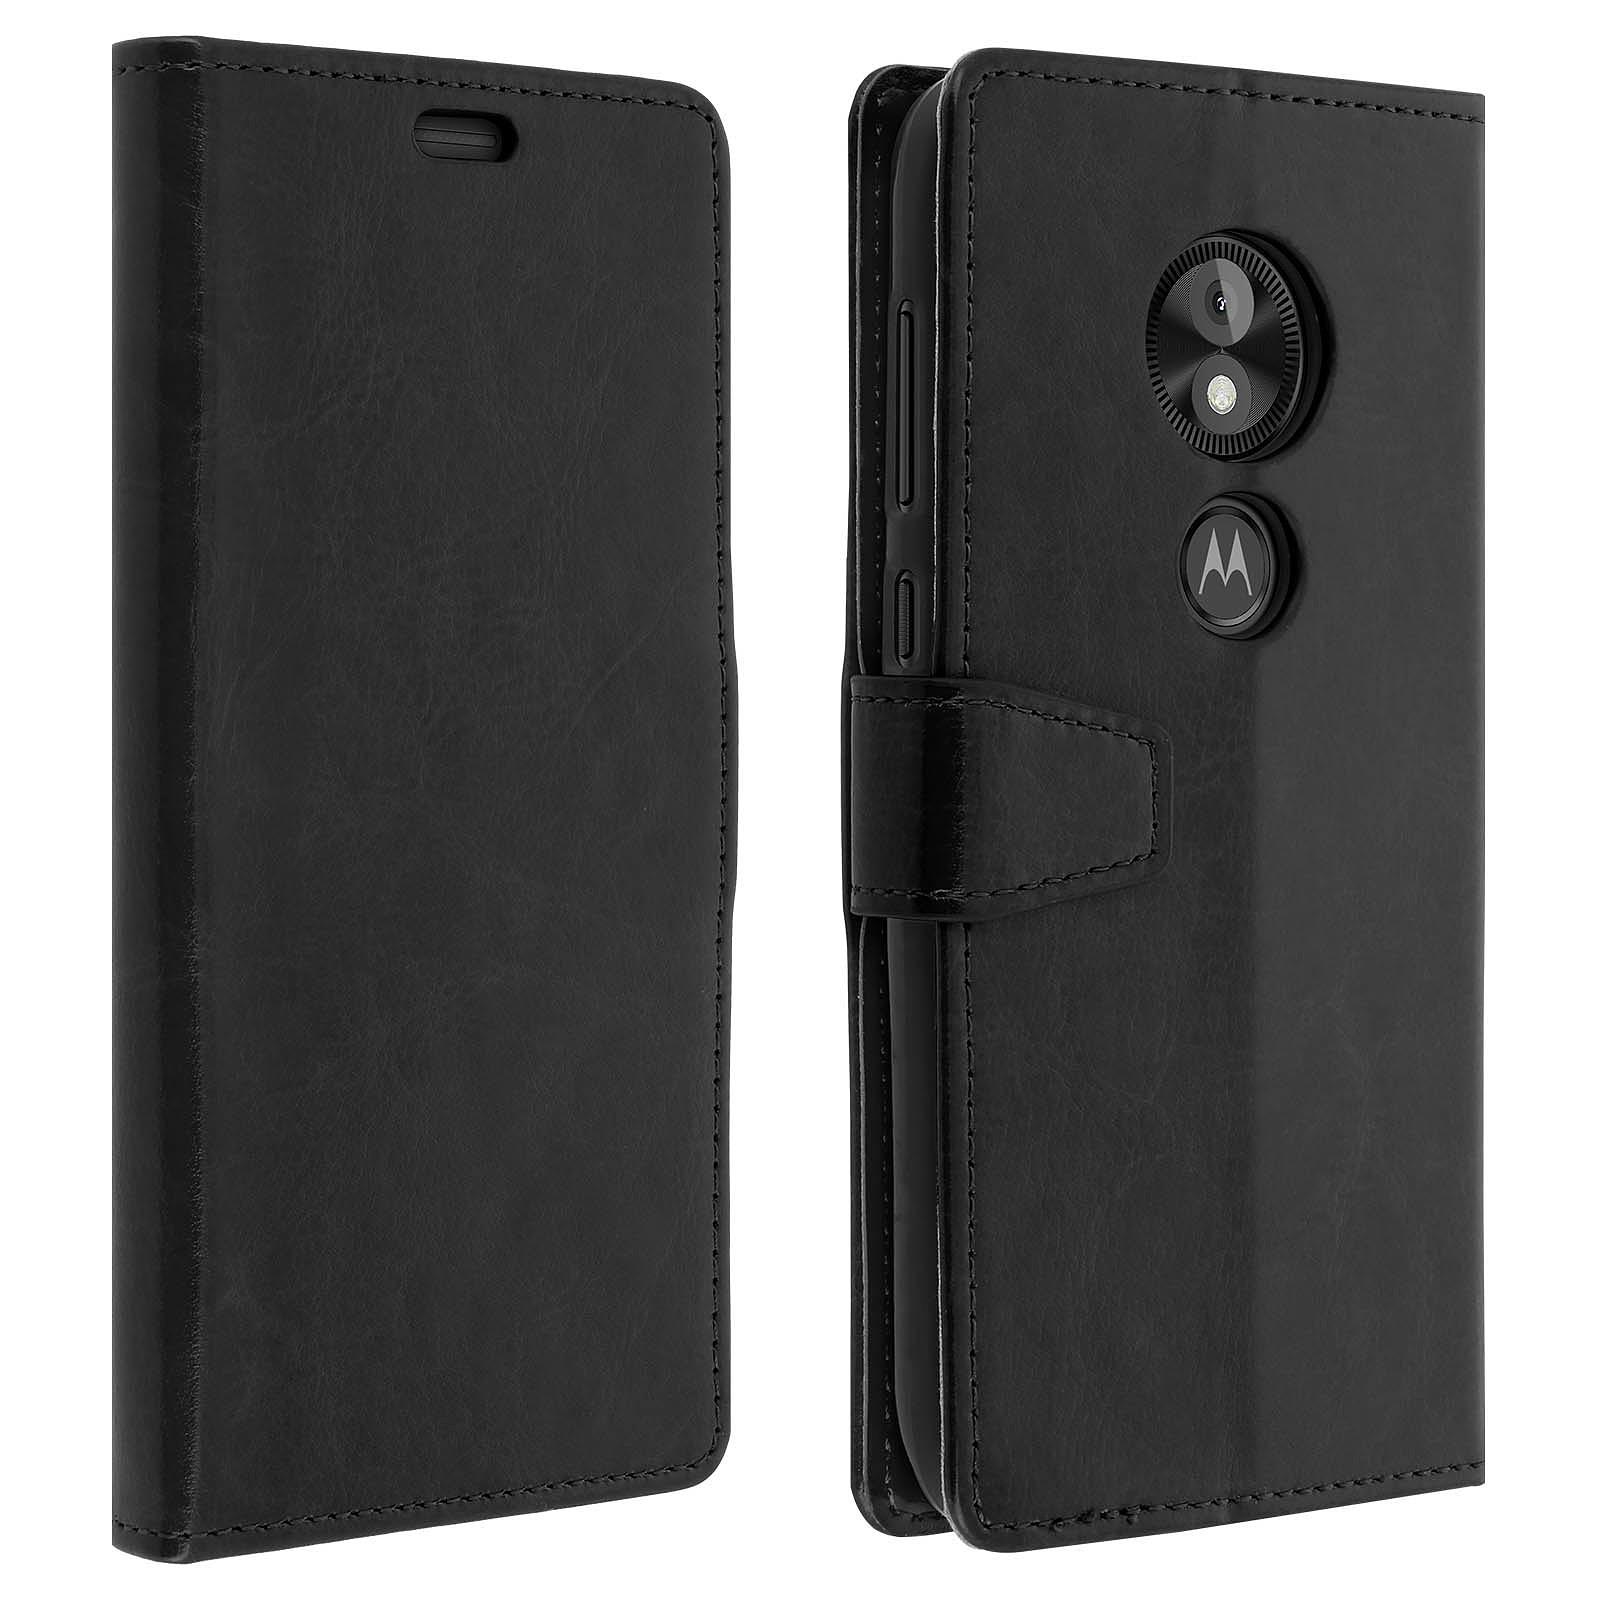 Avizar Etui folio Noir pour Motorola Moto E5 Play